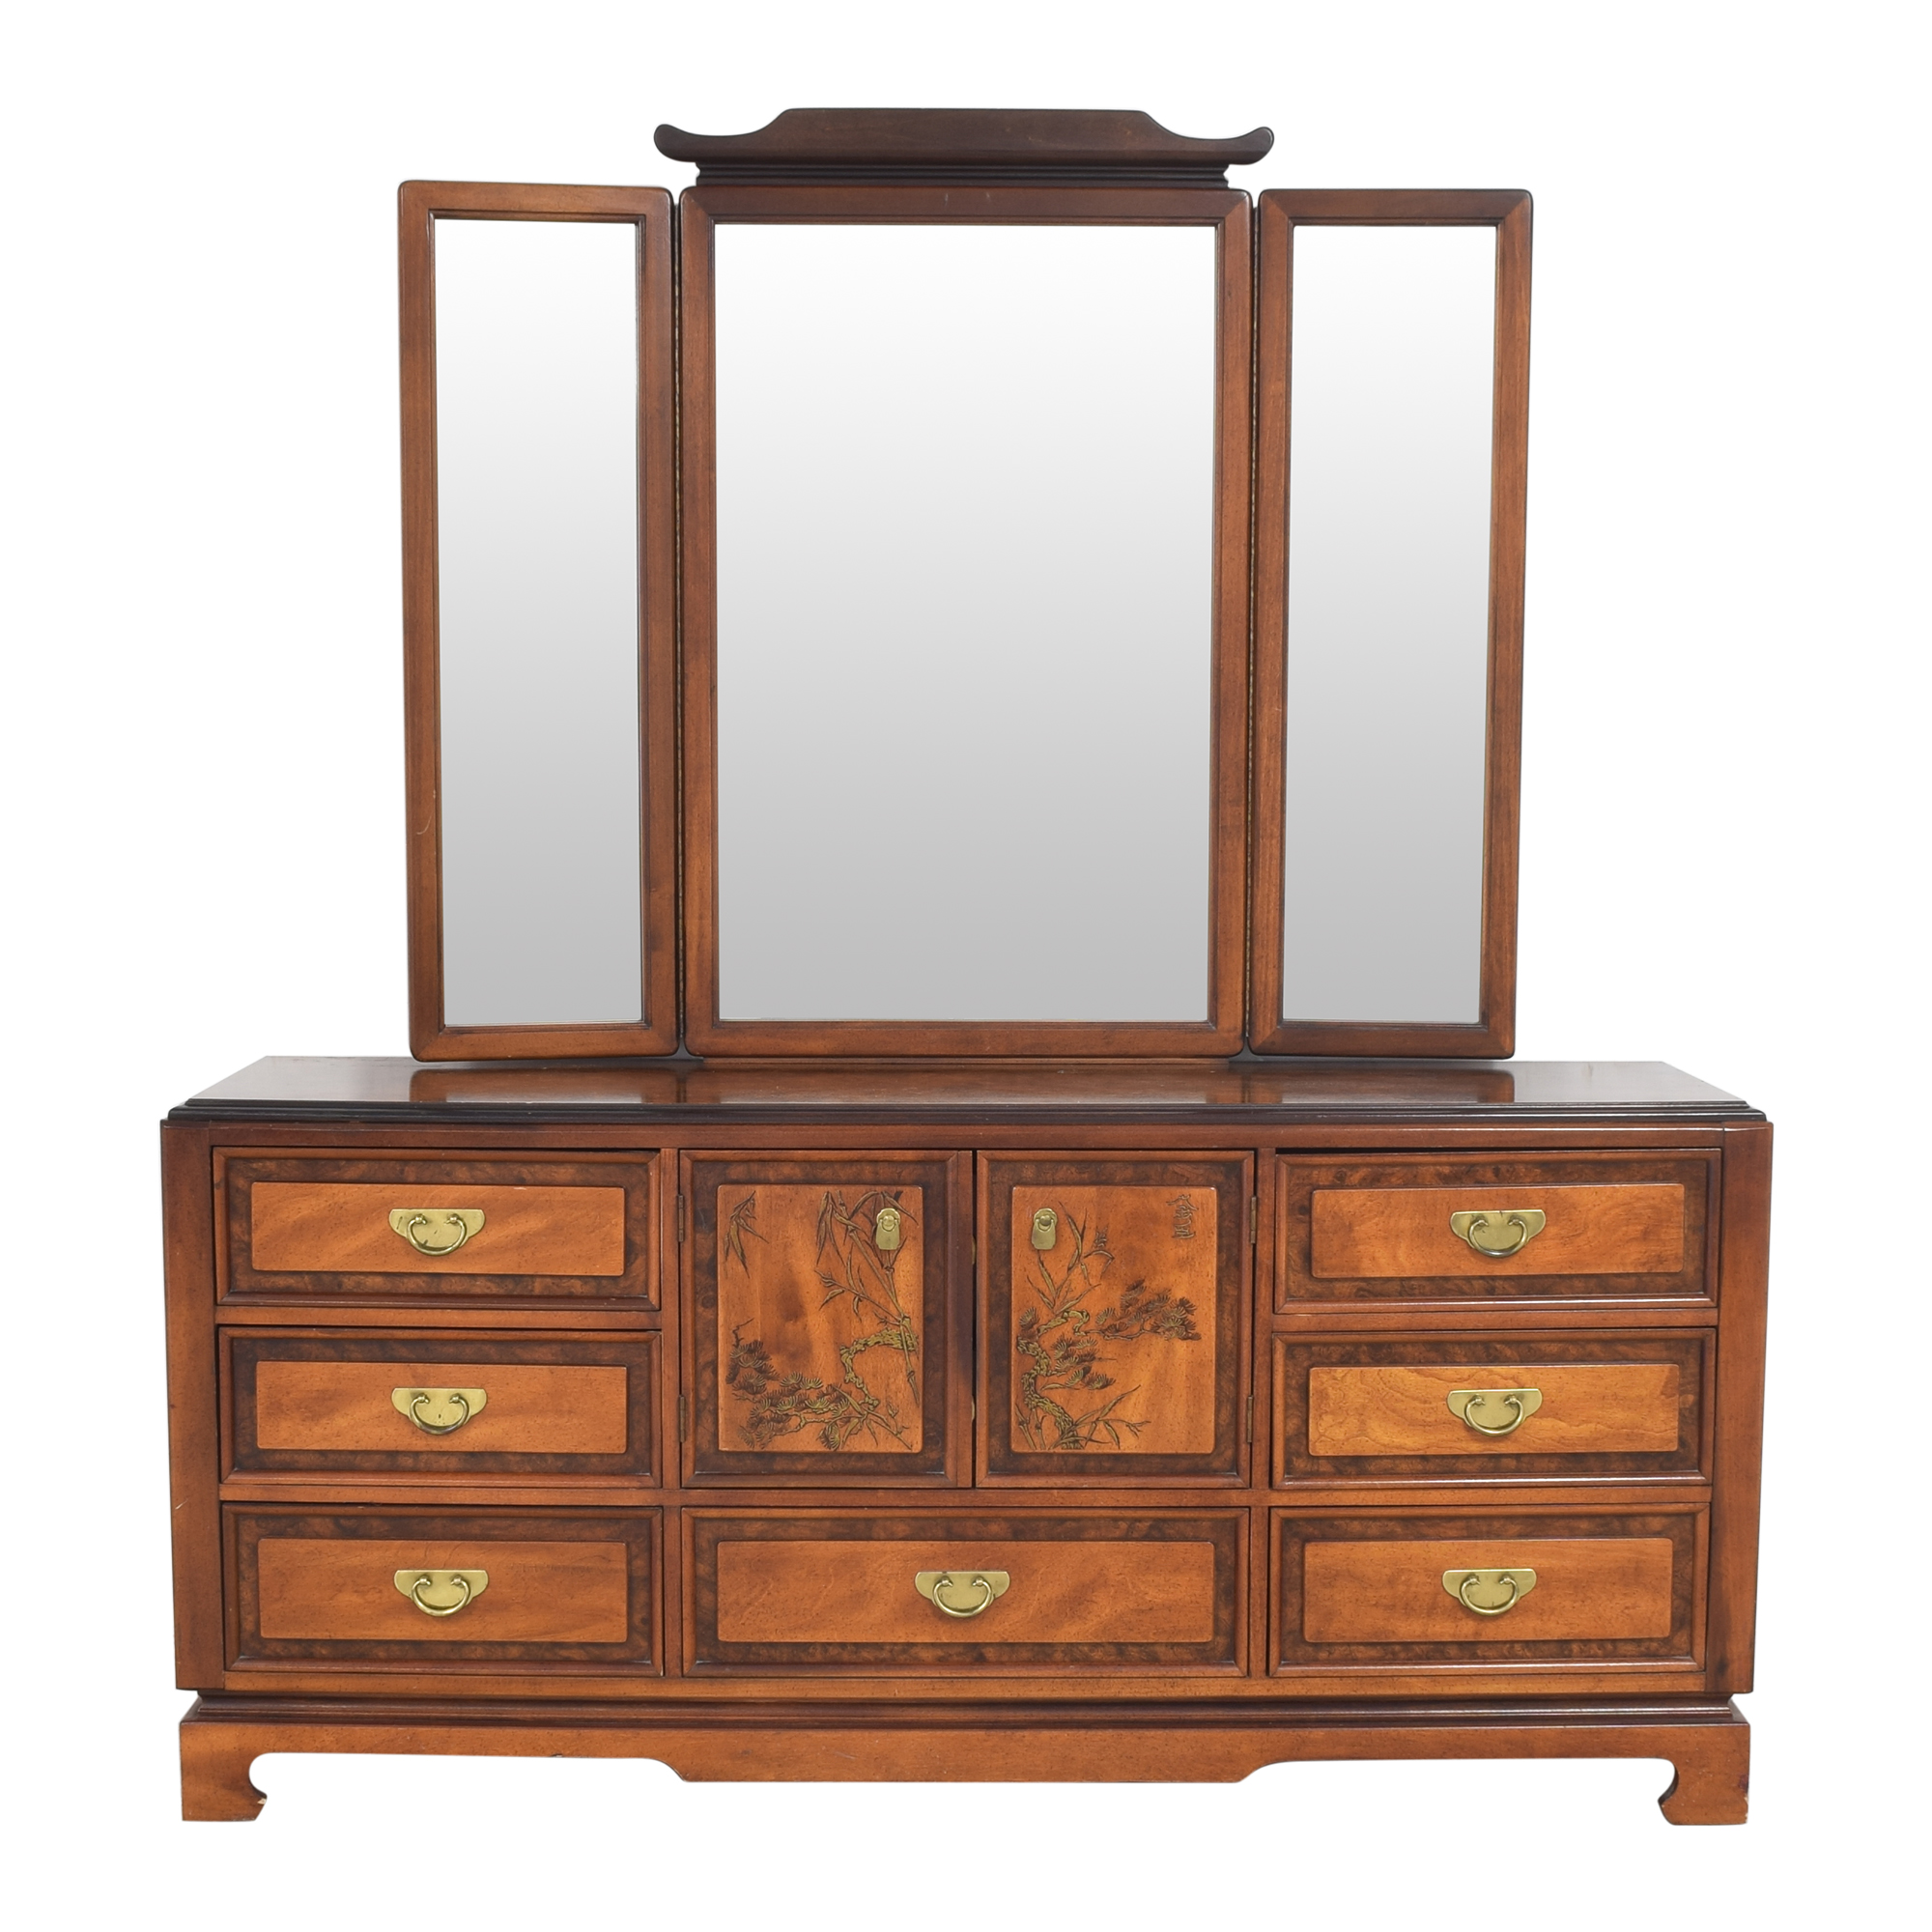 buy Bassett Furniture Chinoiserie Dresser with Trifold Mirror Bassett Furniture Dressers